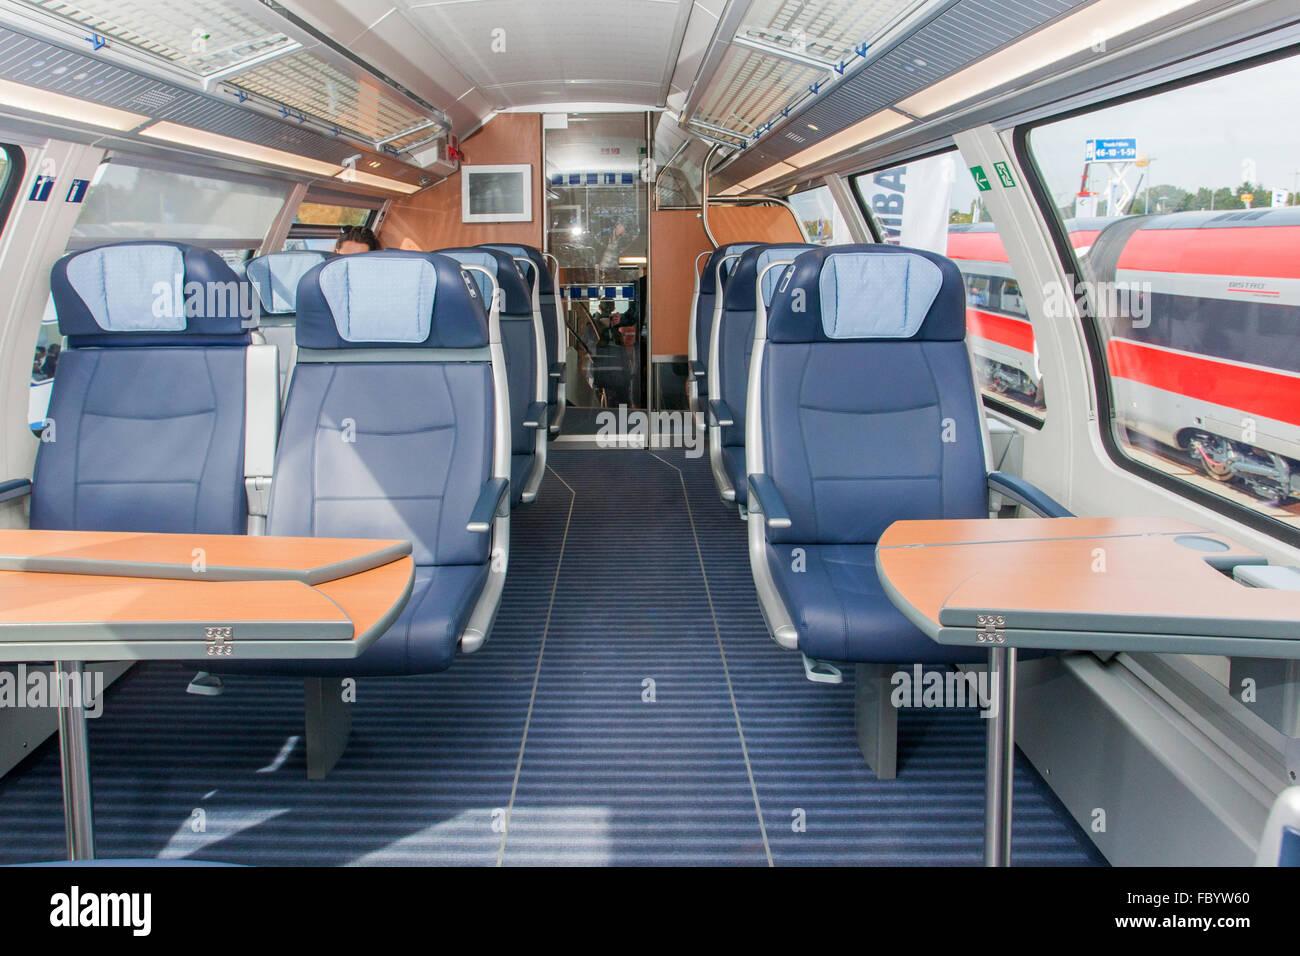 https://c8.alamy.com/comp/FBYW60/intercity-double-deck-trains-for-deutsche-bahn-FBYW60.jpg